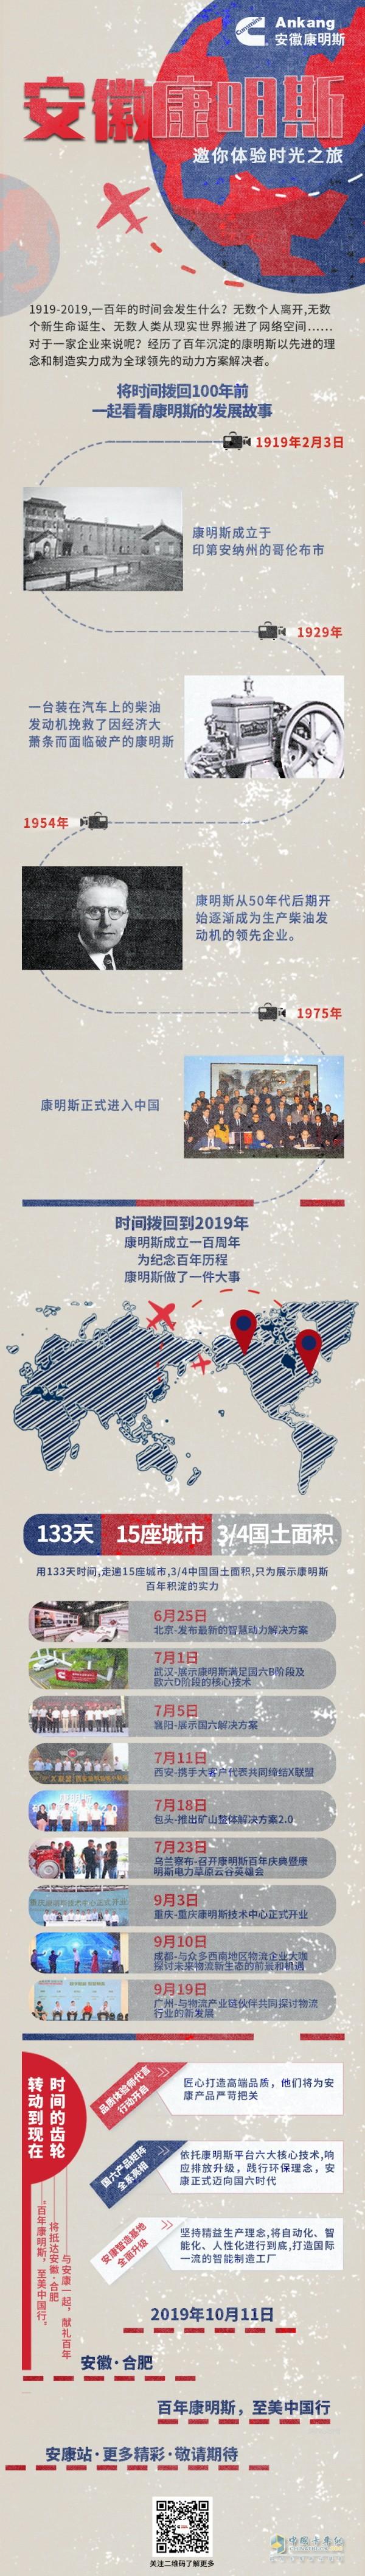 Anhui Cummins development history